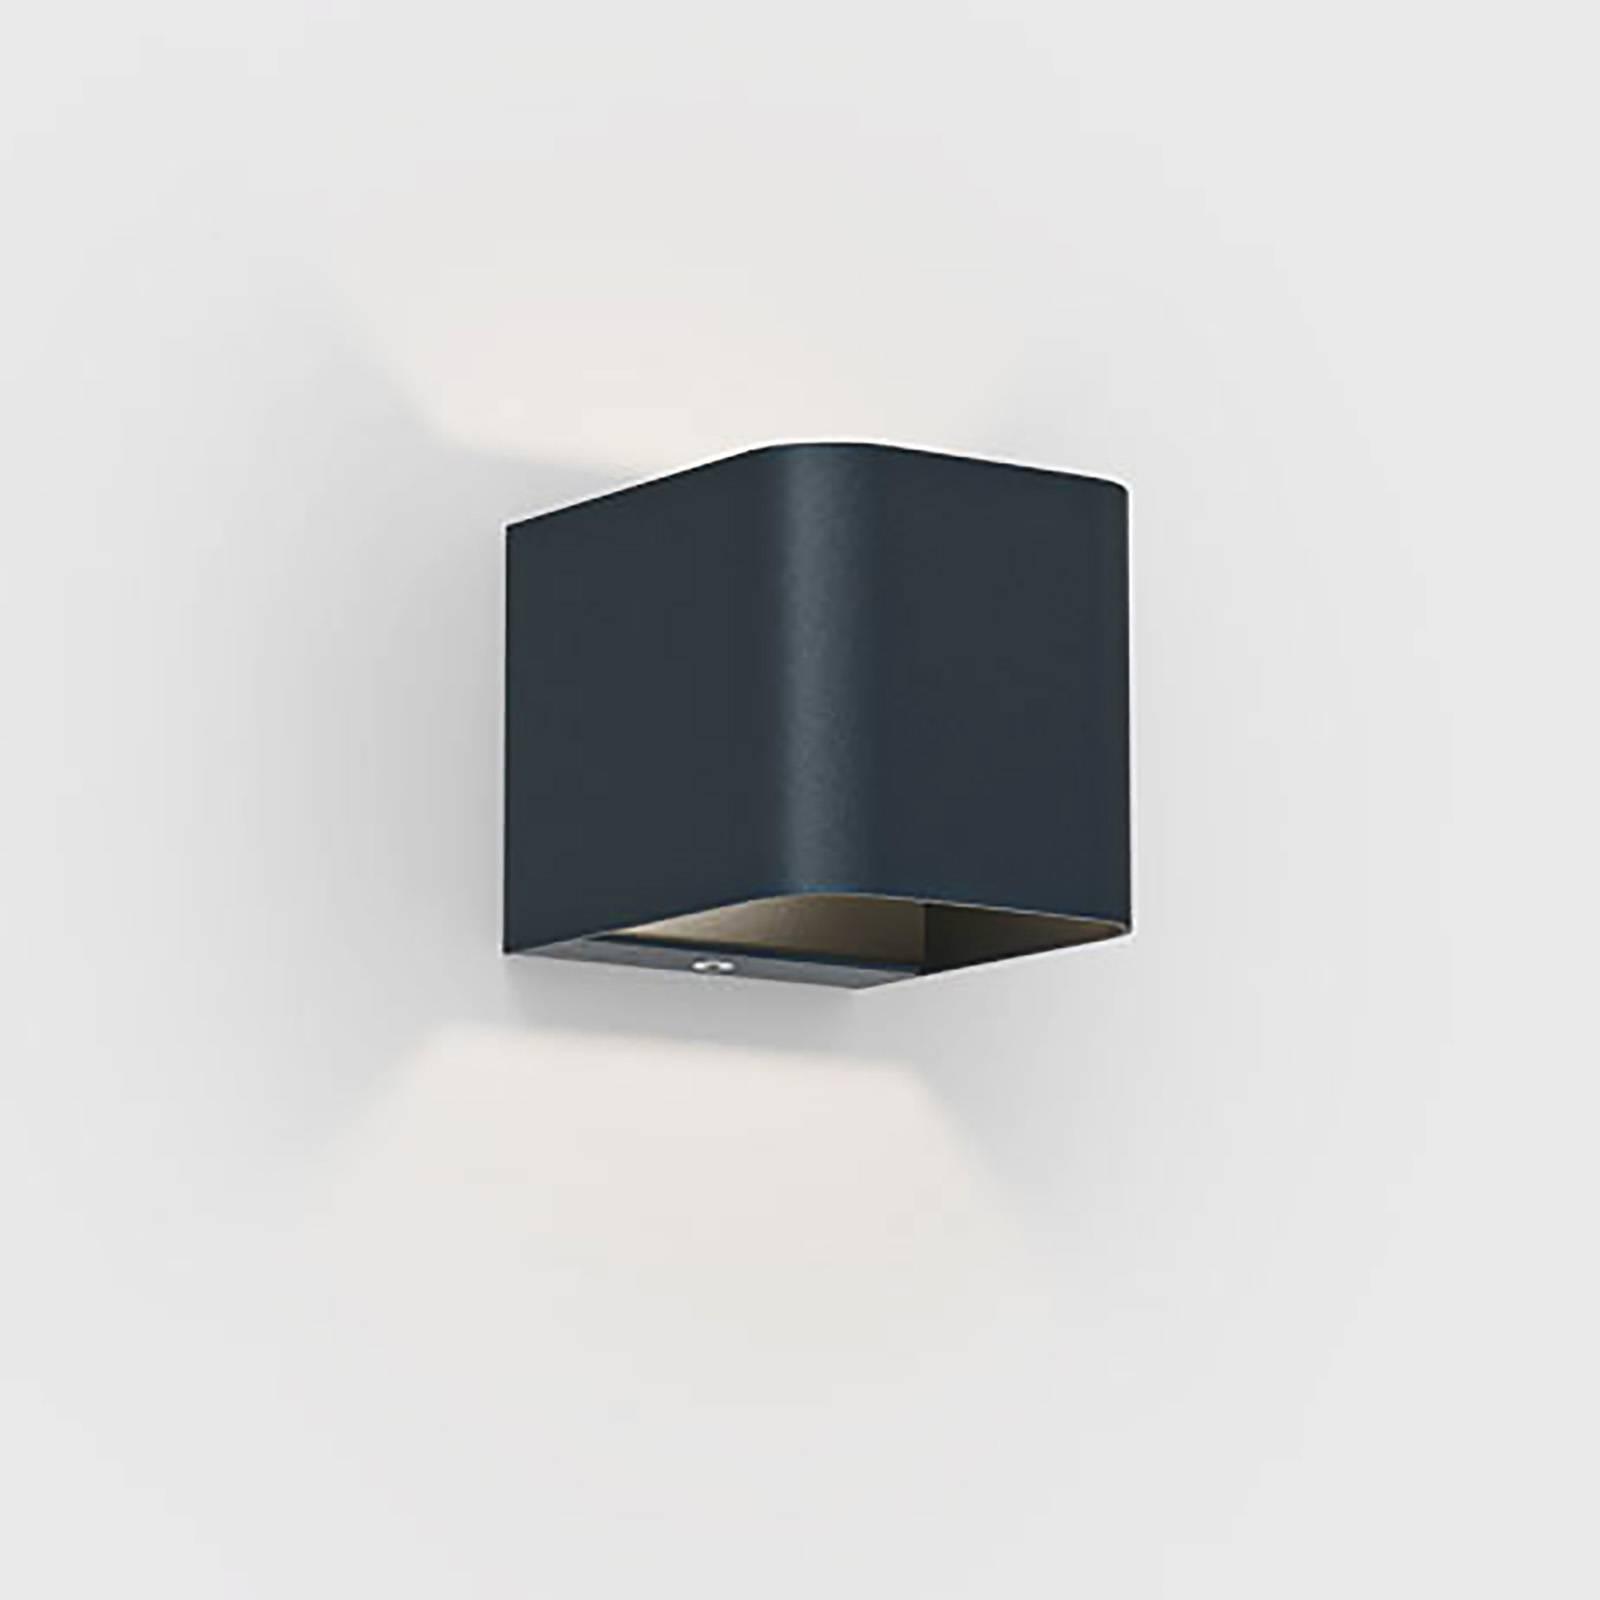 IP44.de Intro 2.0 LED-Außenwandleuchte, deep black